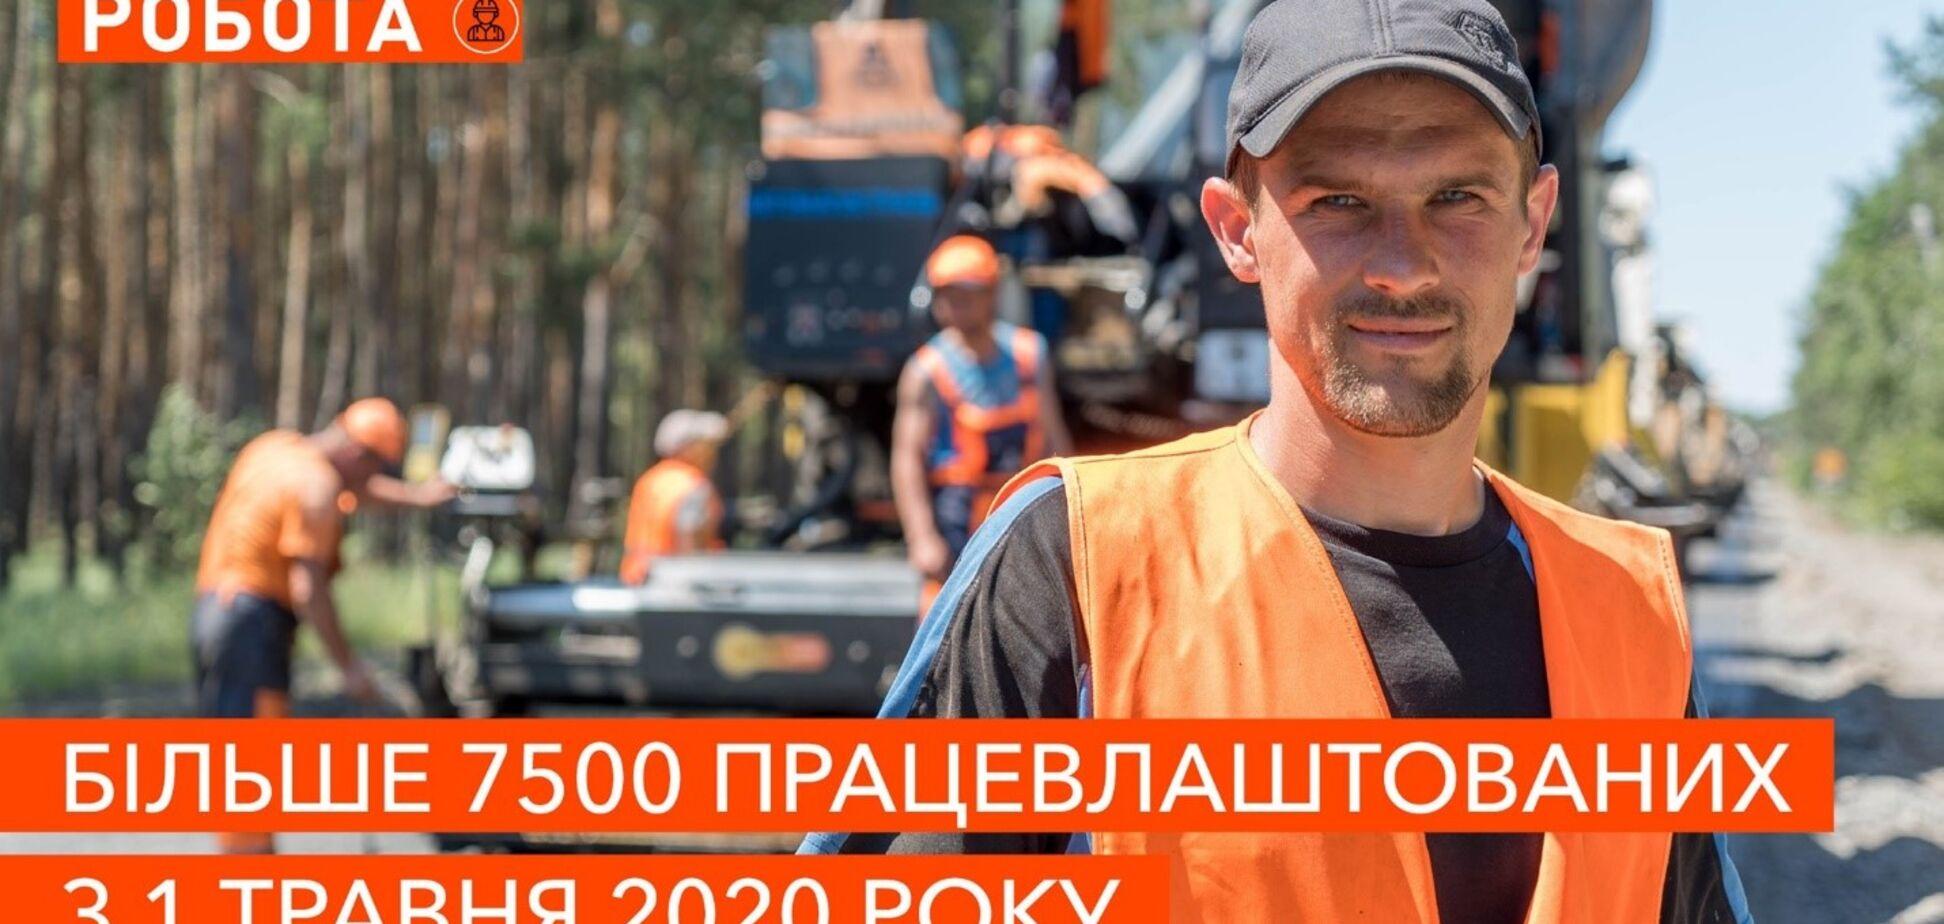 За 6 недель на 'Великому Будівництві' трудоустроено уже более 7 000 человек